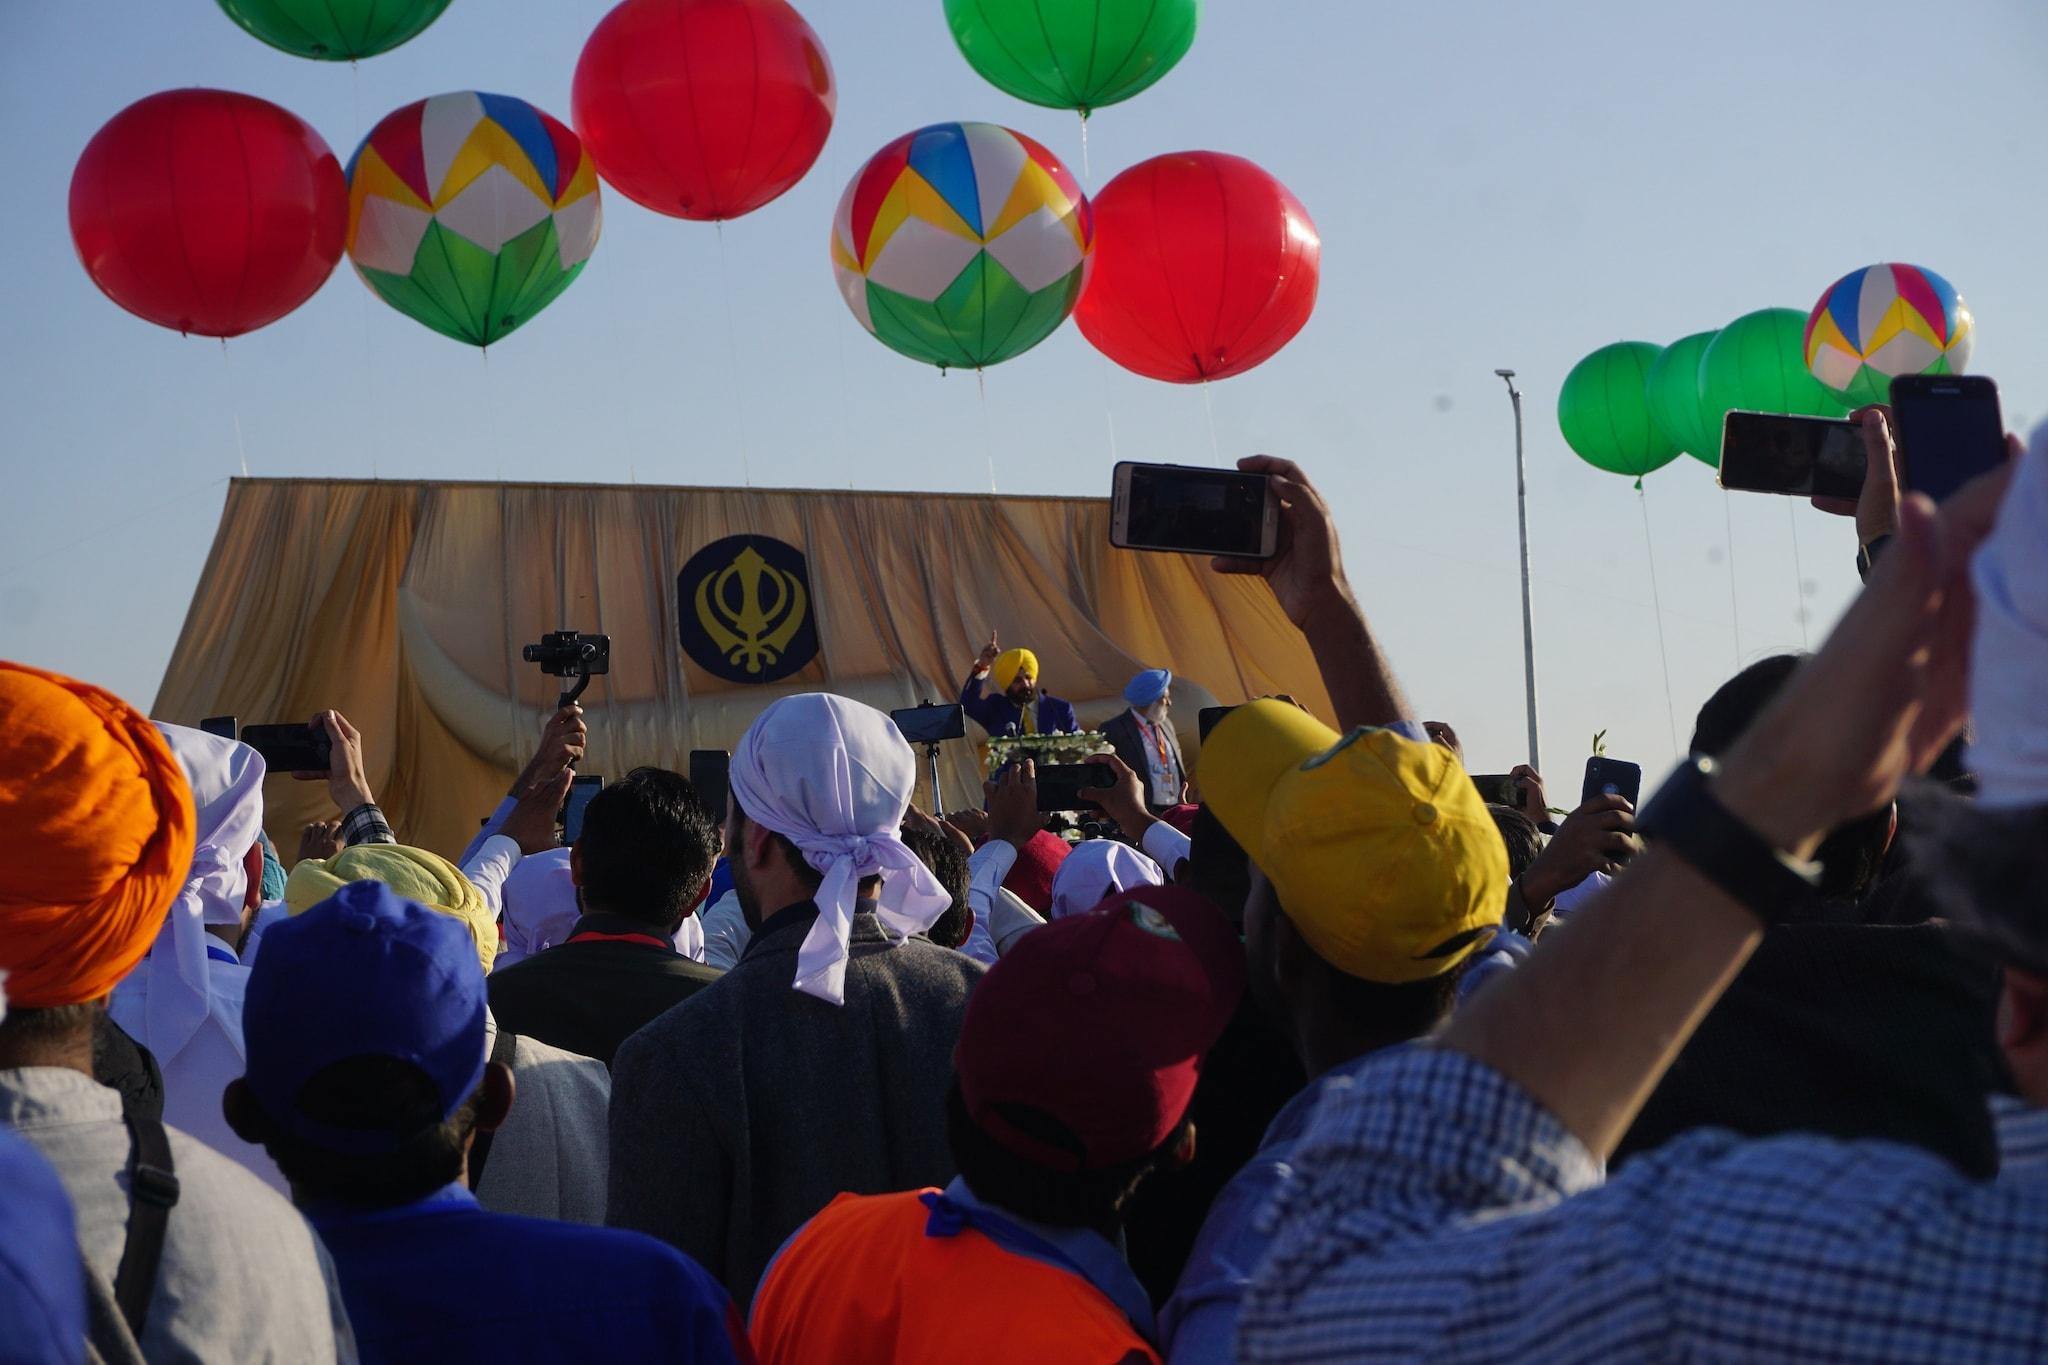 Navjot Singh Sidhu cheered by the gathered crowd.